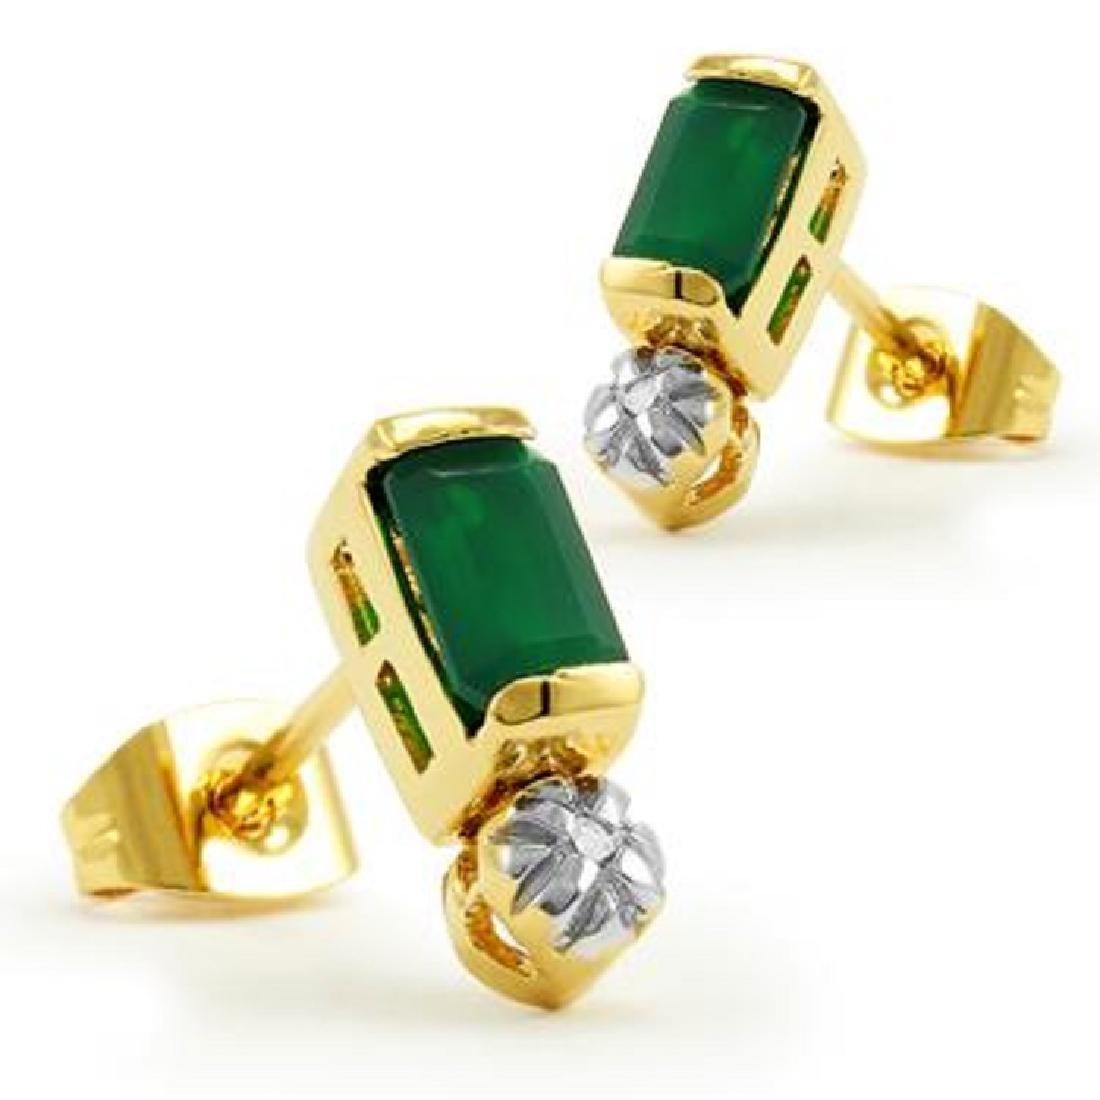 1.3 CT Green Agate Cut Green Agate and Diamond Earrings